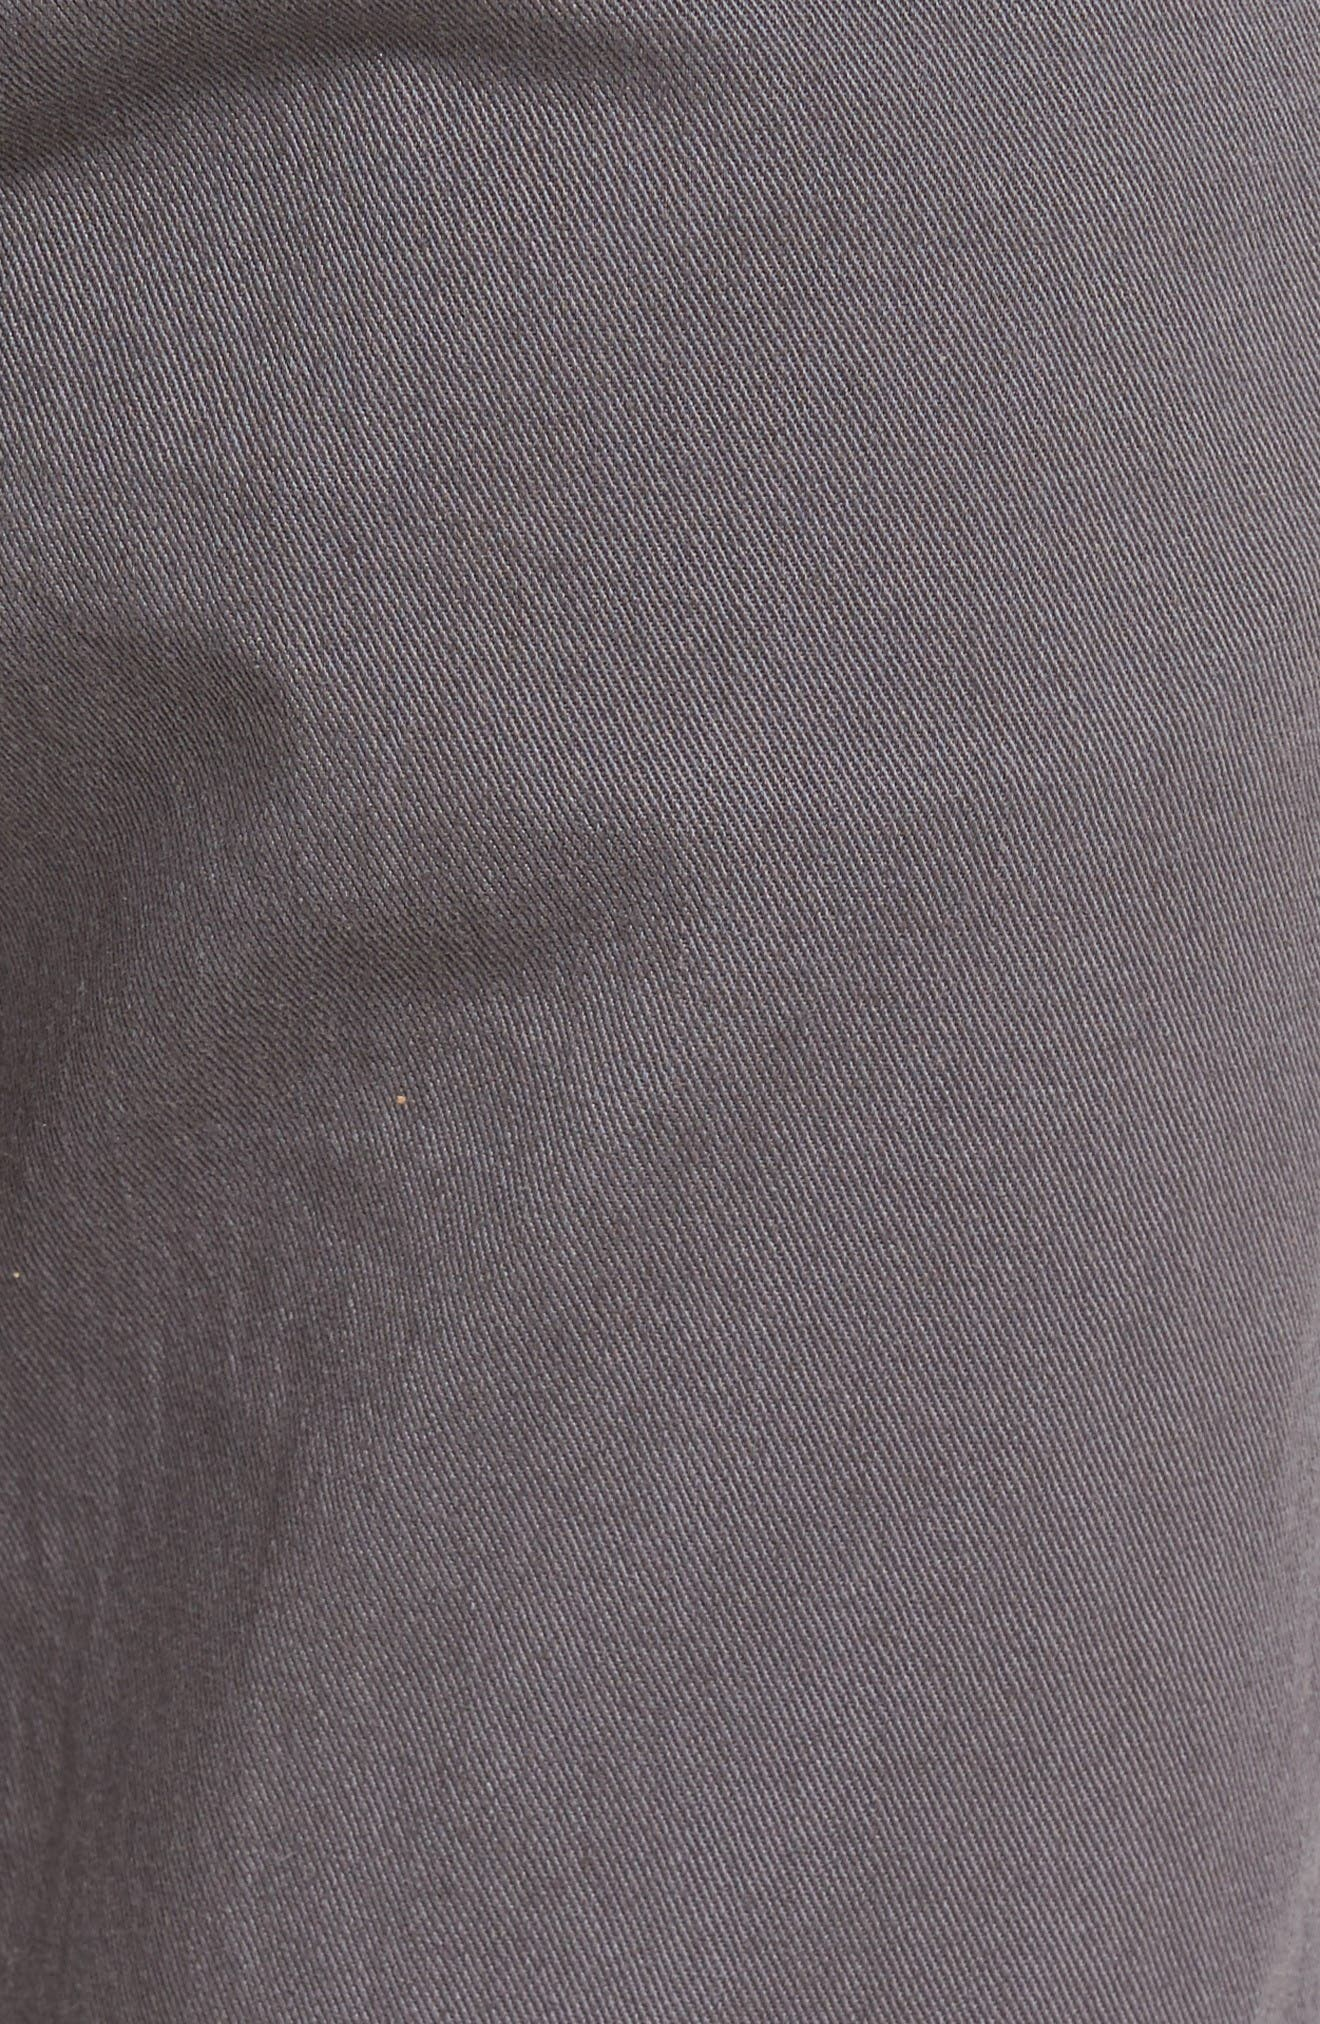 Tyler Slim Fit Jeans,                             Alternate thumbnail 5, color,                             Iron Gate